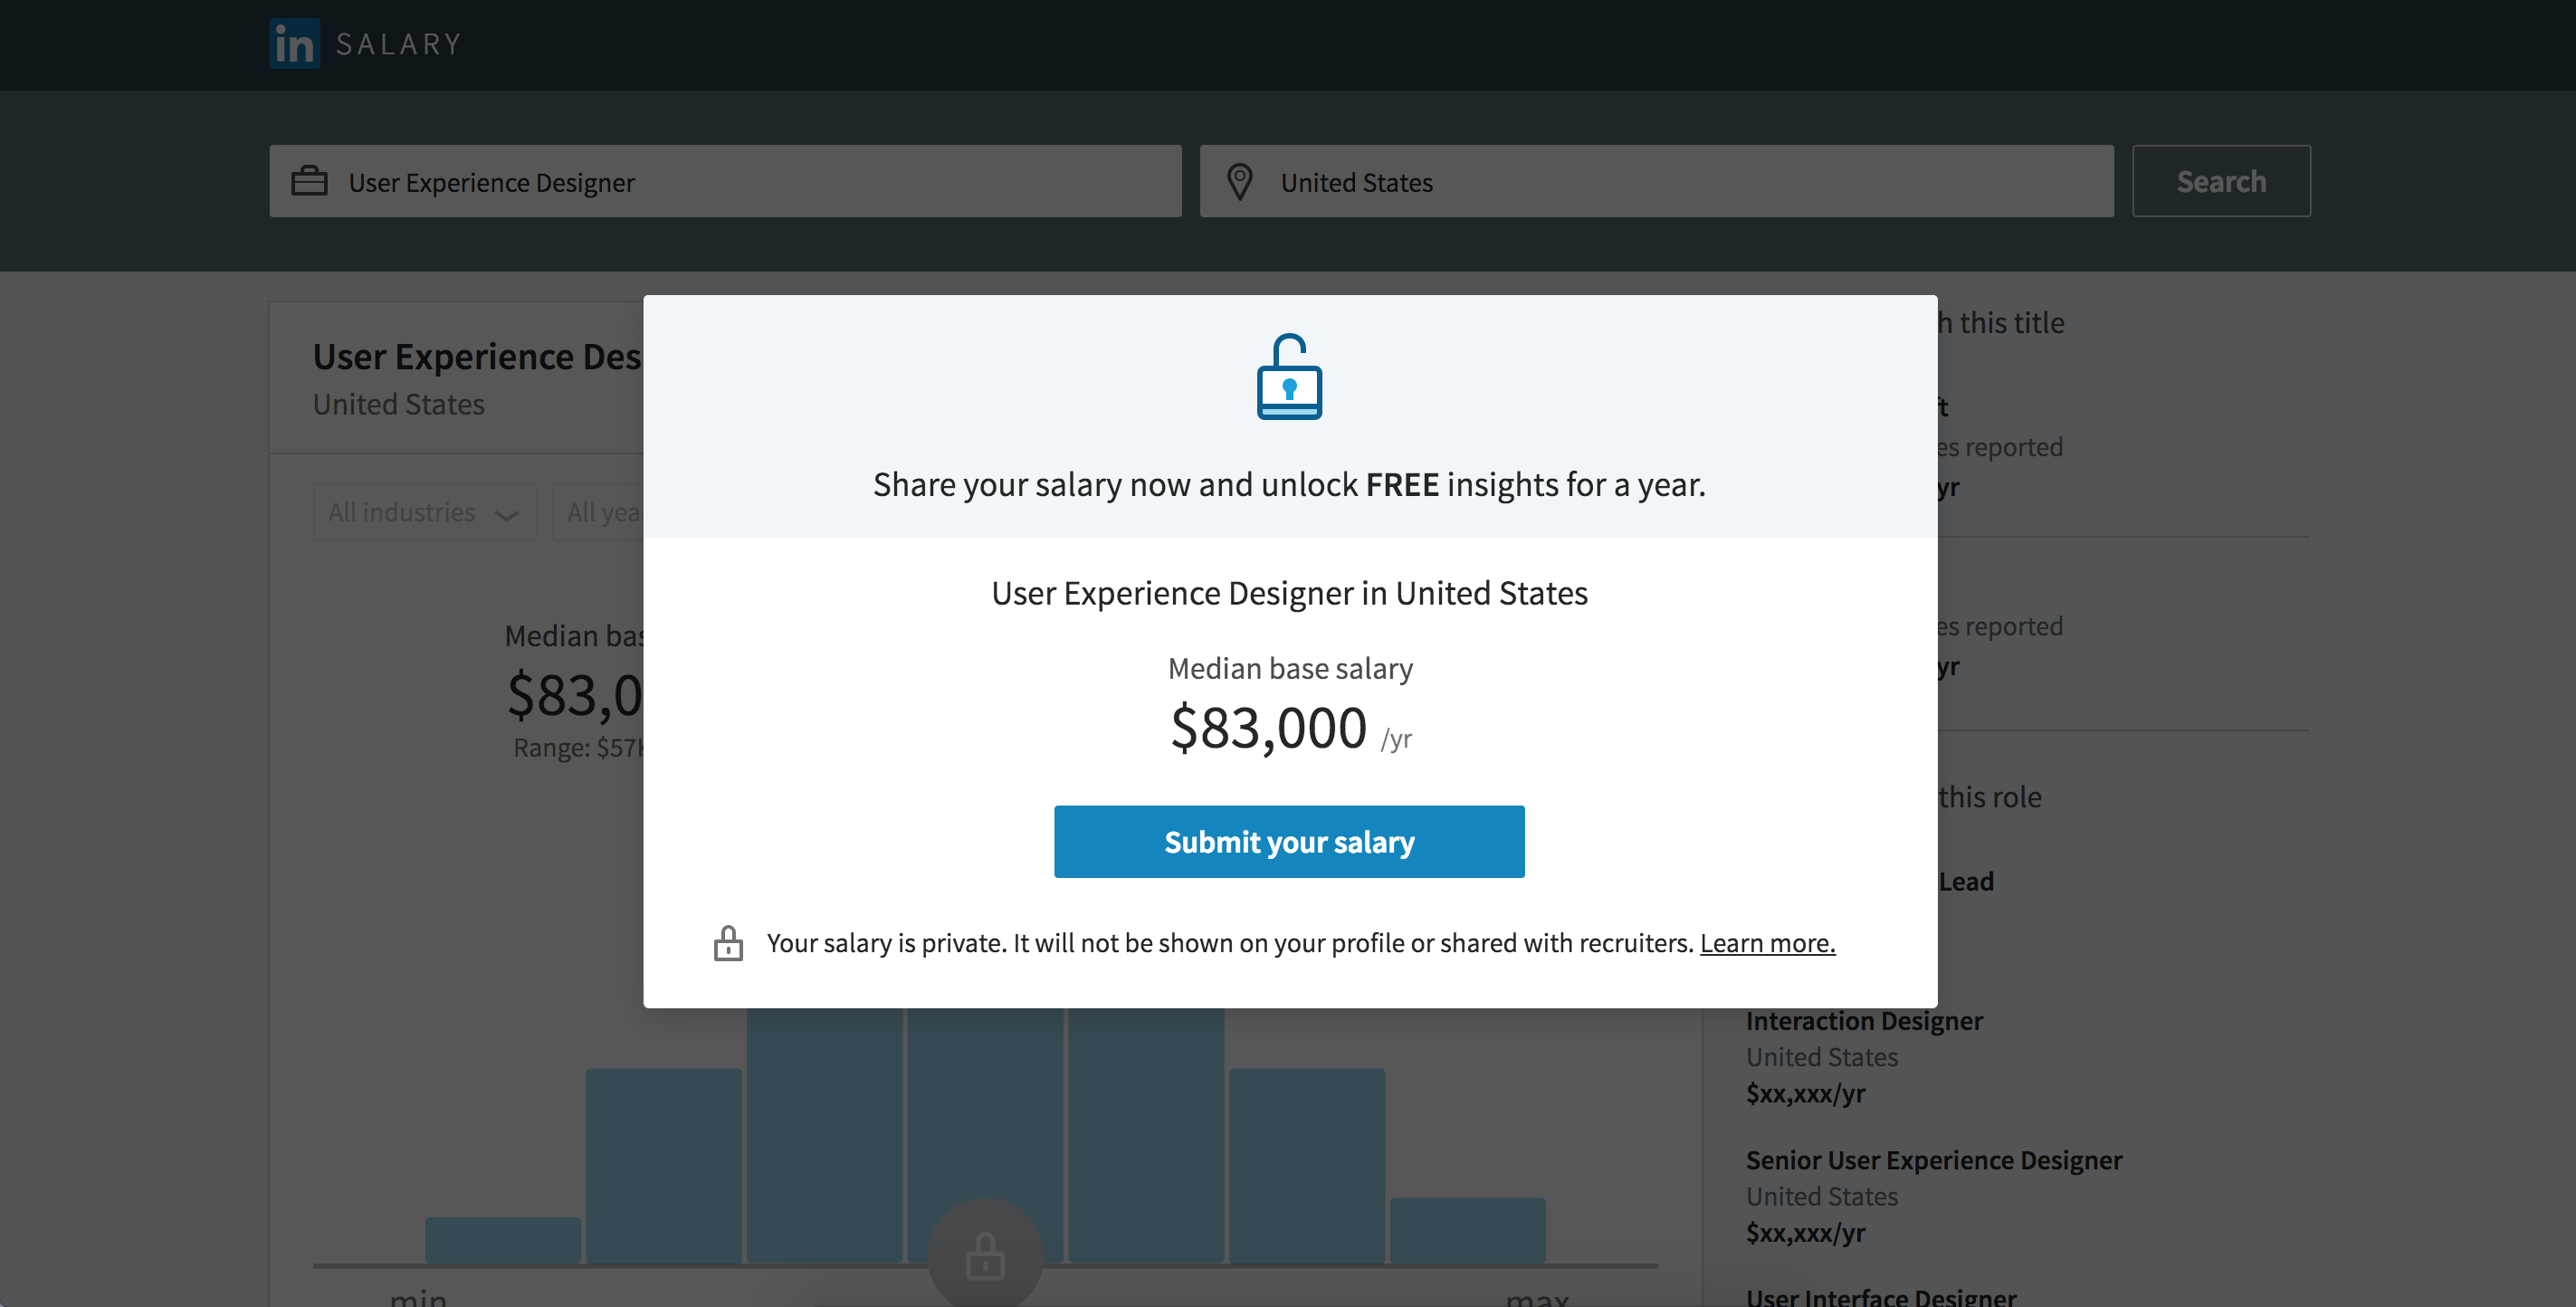 UX Designer Salary on LinkedIn